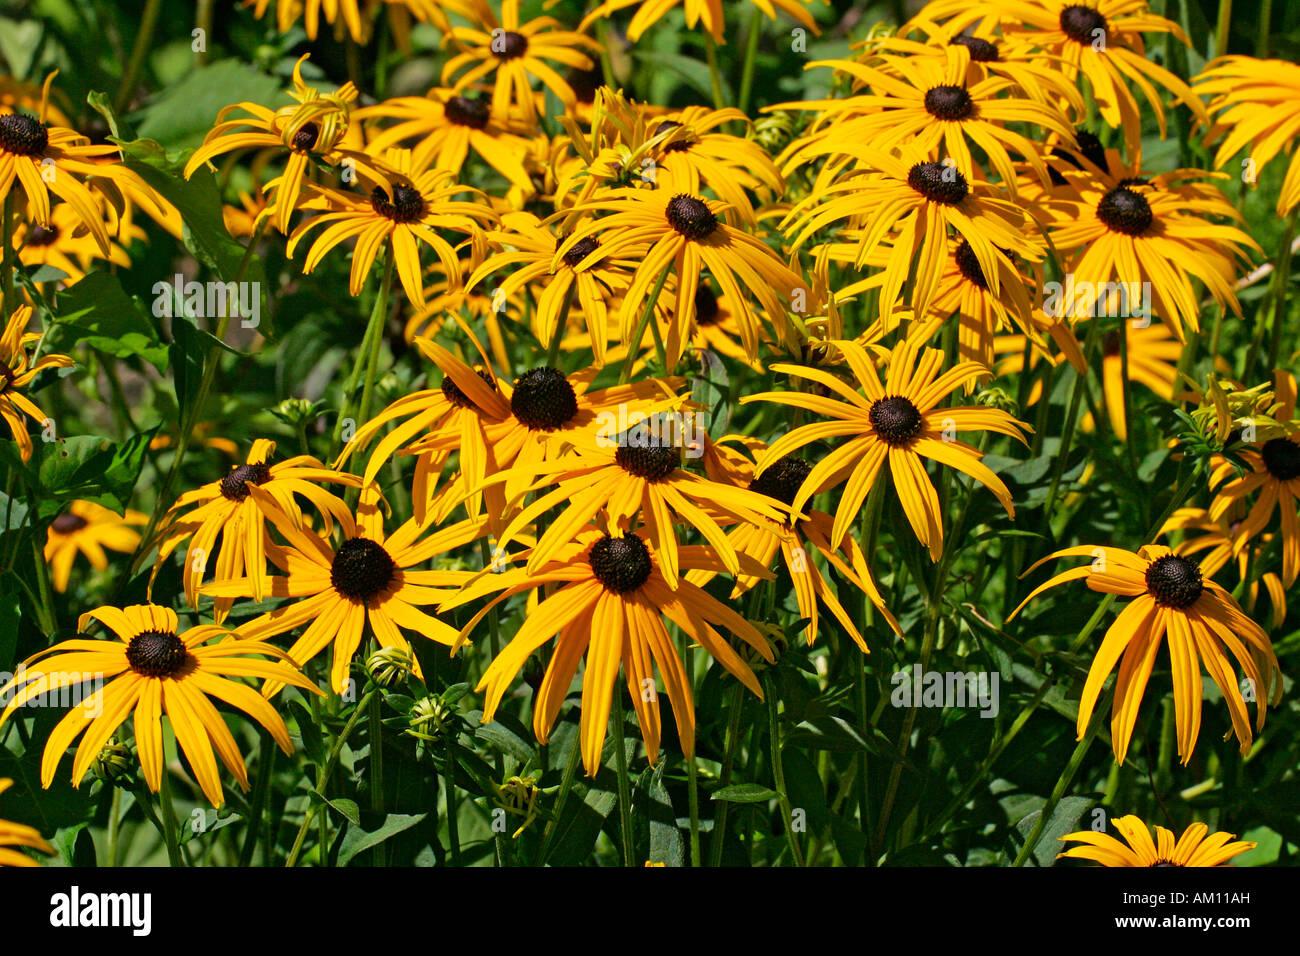 Flowering cone flower cultivar Goldsturm (Rudbeckia fulgida var. sullivantii cultivar Goldsturm) - Stock Image